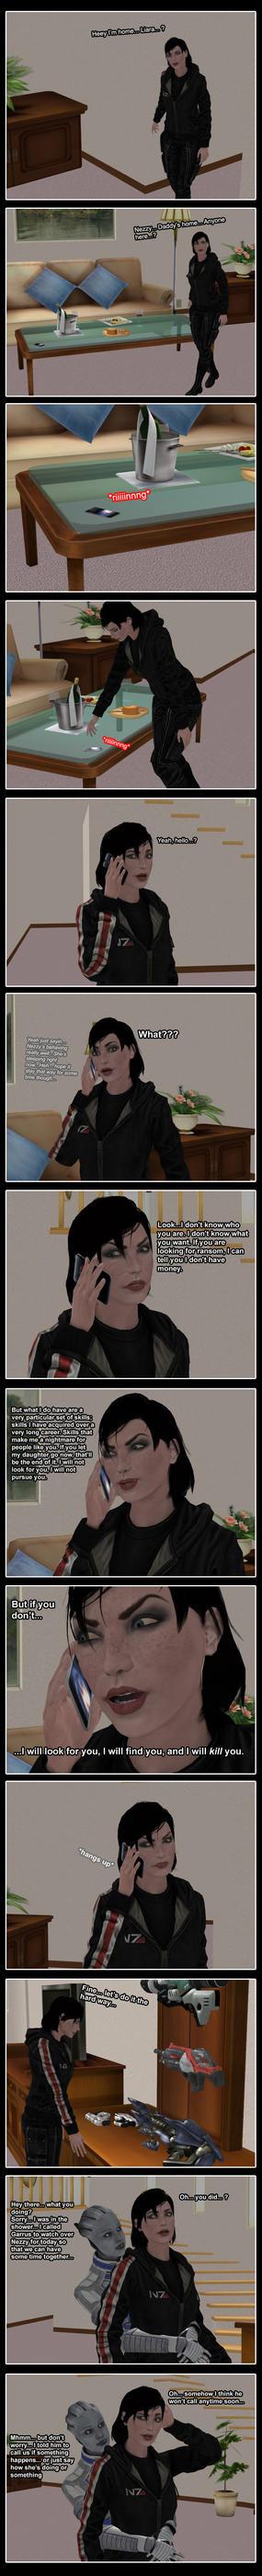 Mass Effect: Taken by Yuri-World-Ruler